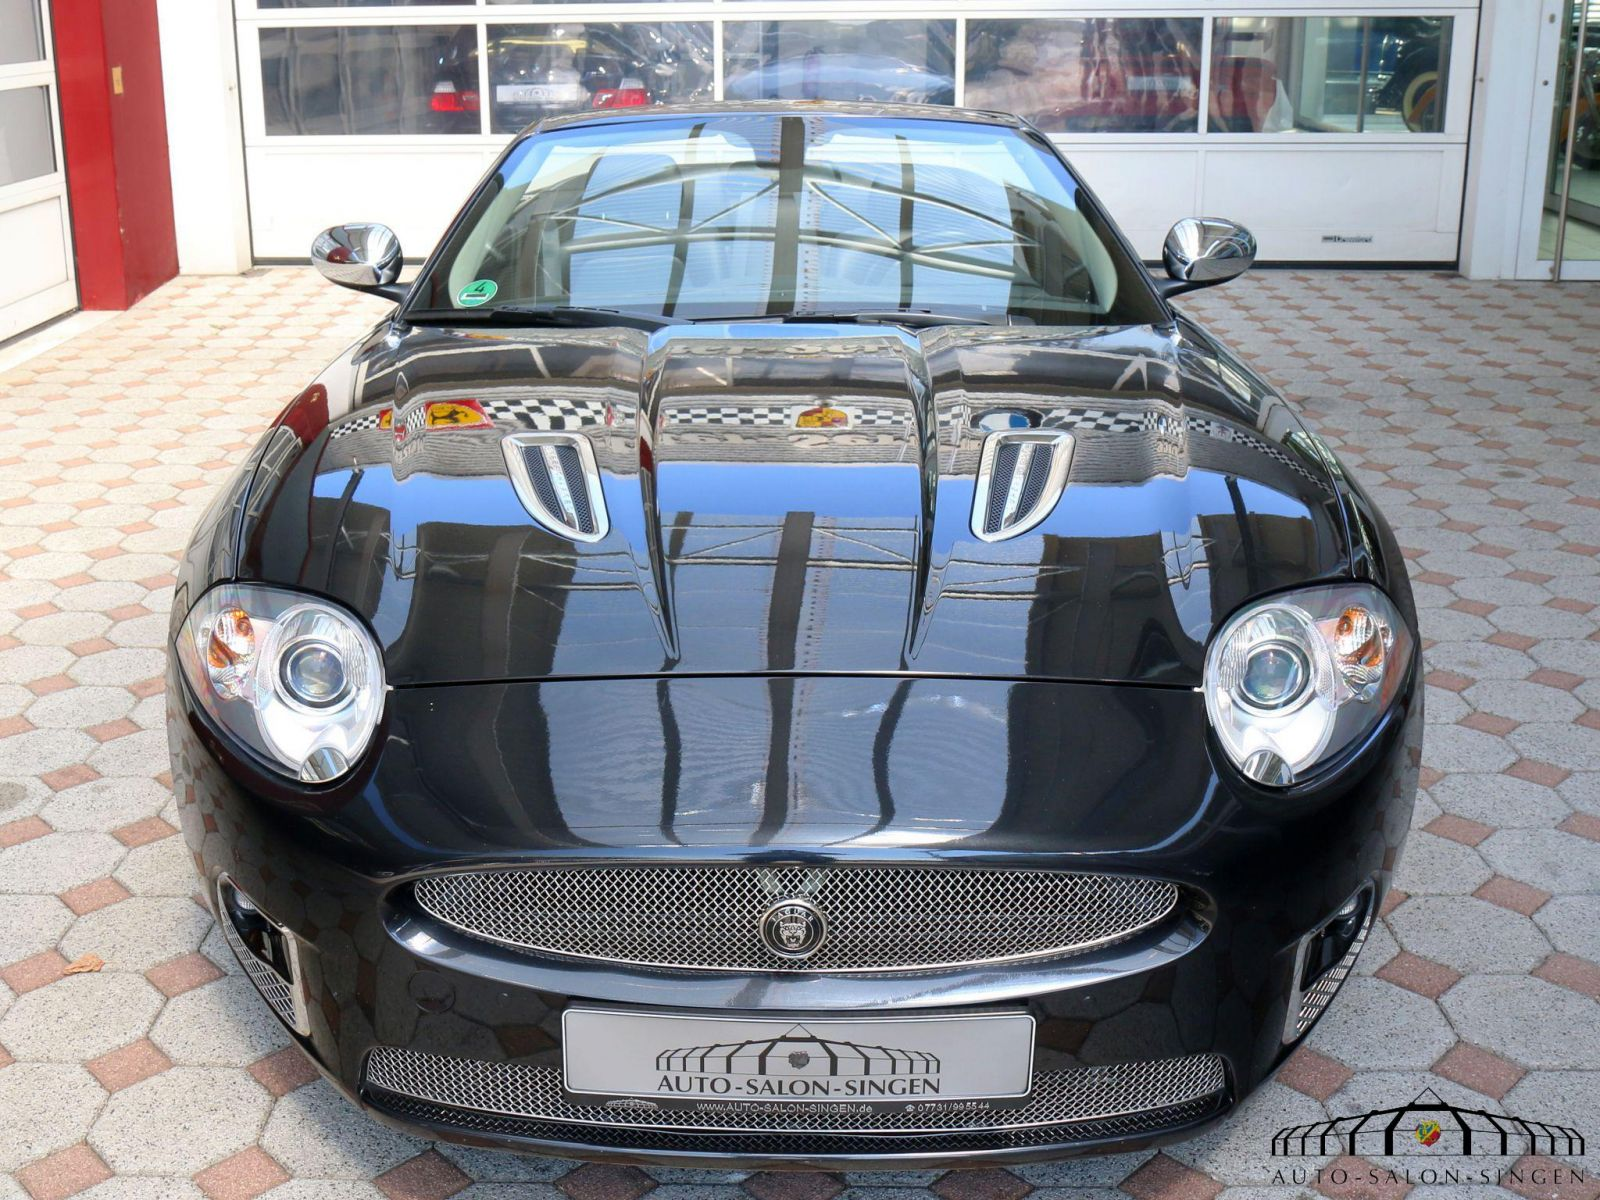 jaguar xkr 4 2 cabrio cabrio auto salon singen. Black Bedroom Furniture Sets. Home Design Ideas